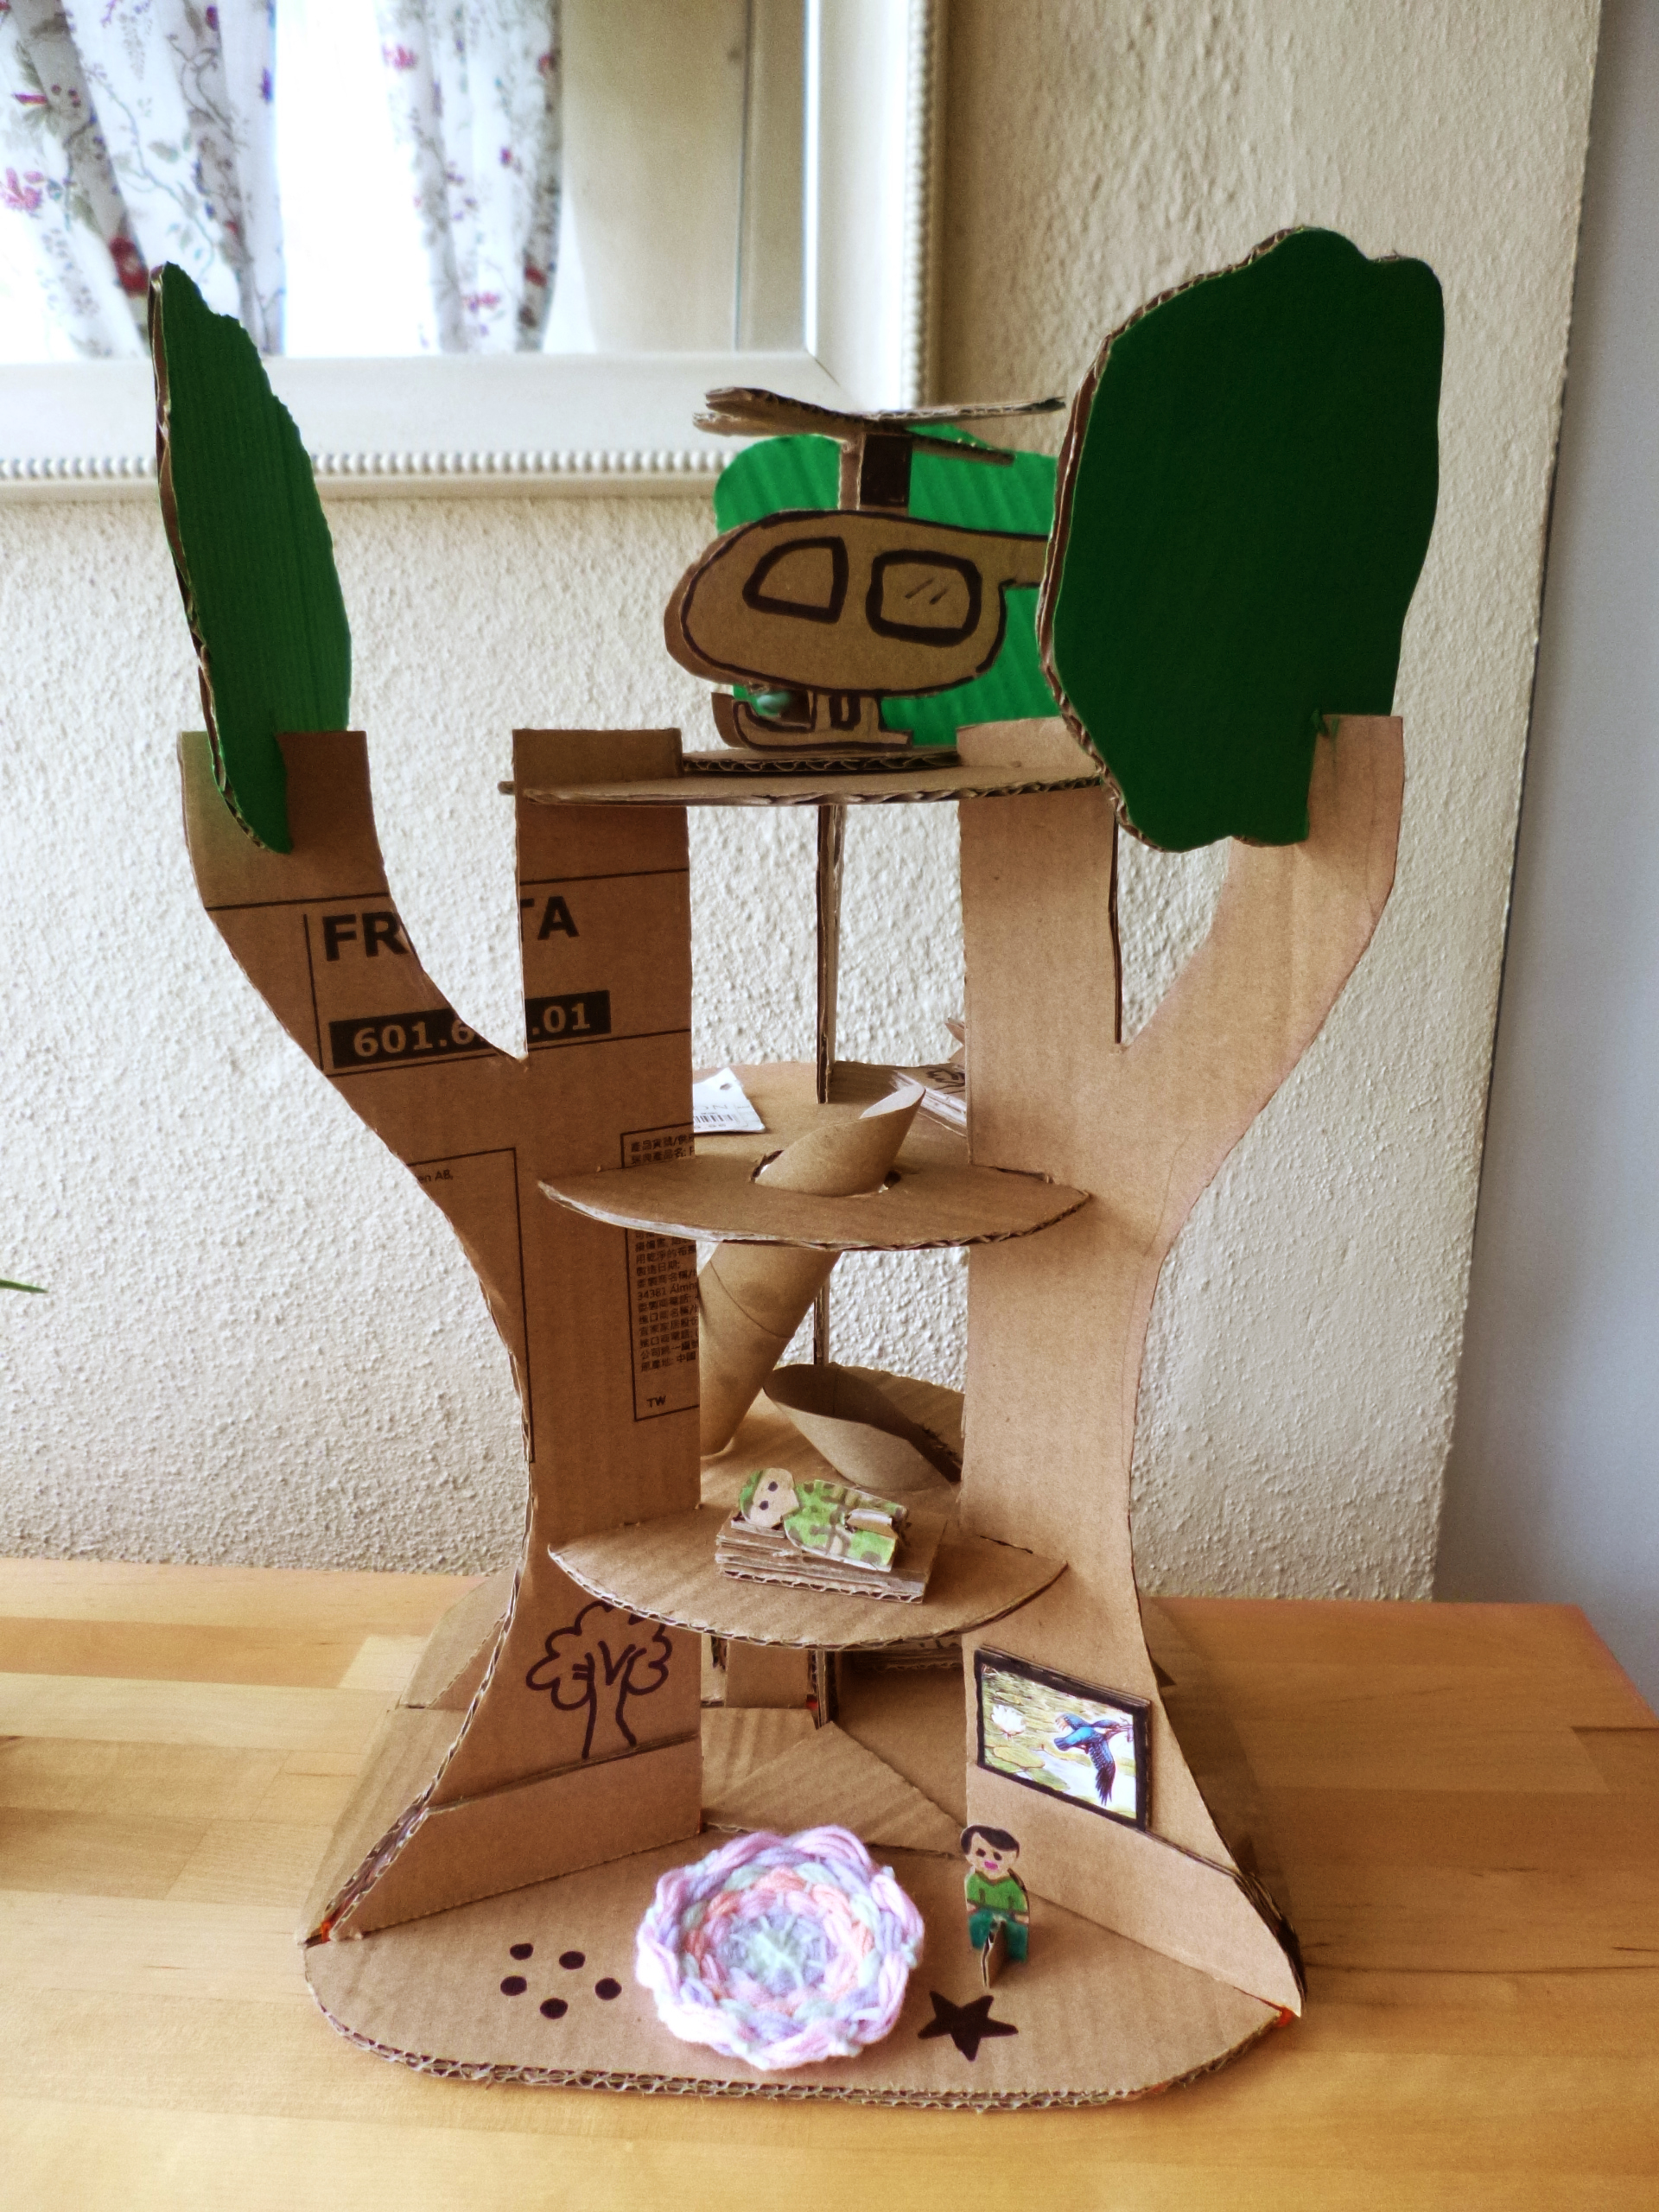 Cardboard treehouse